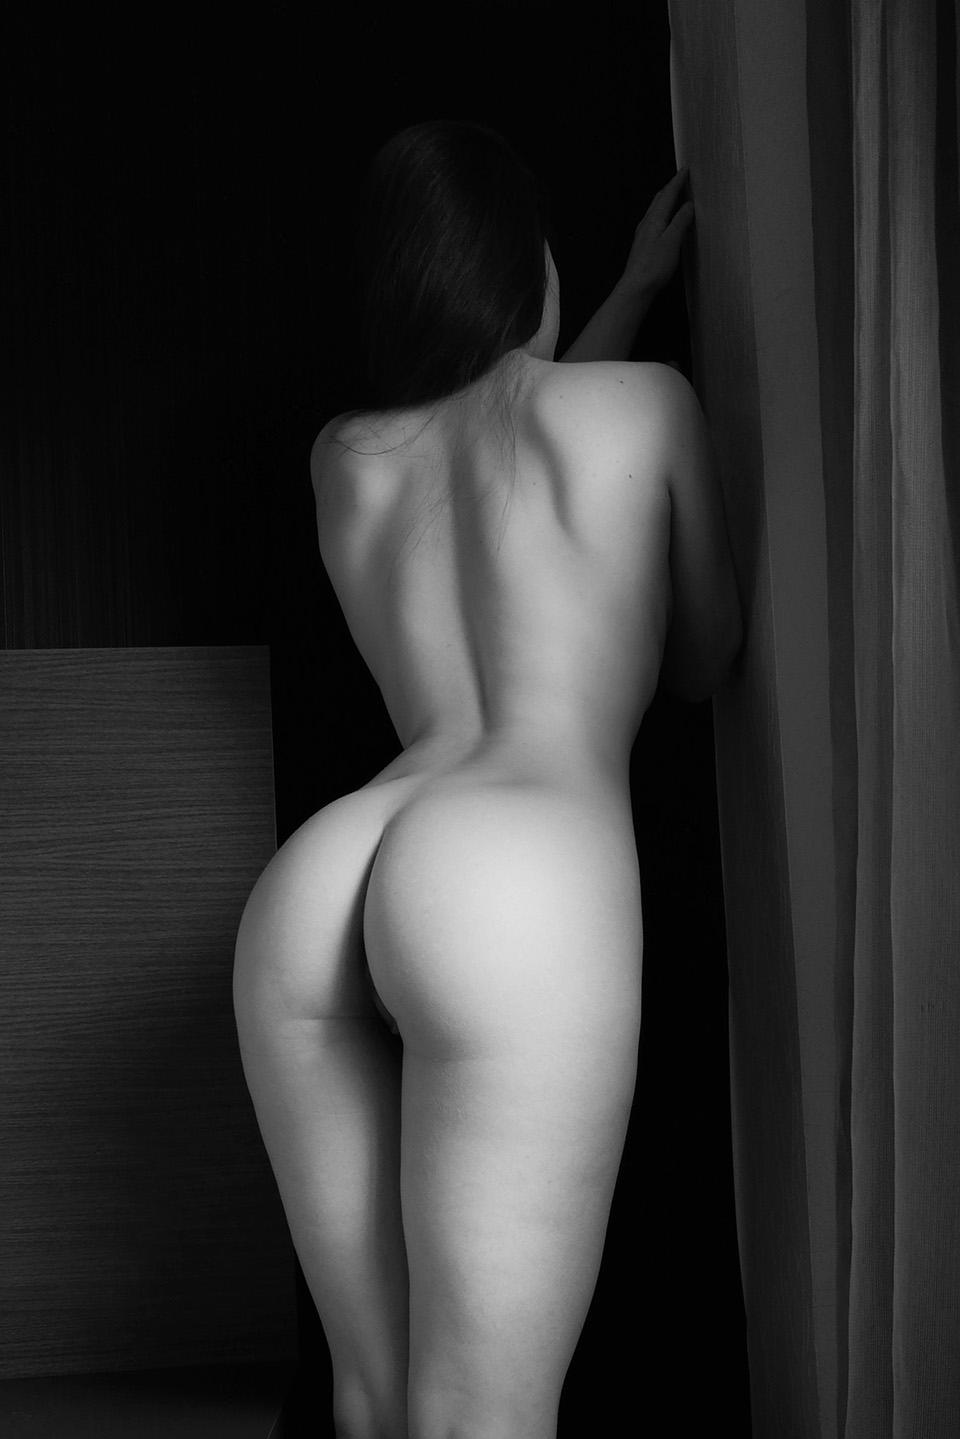 Elle Beth Full Frontal Nude Photos - Celebrity Leaks-6822